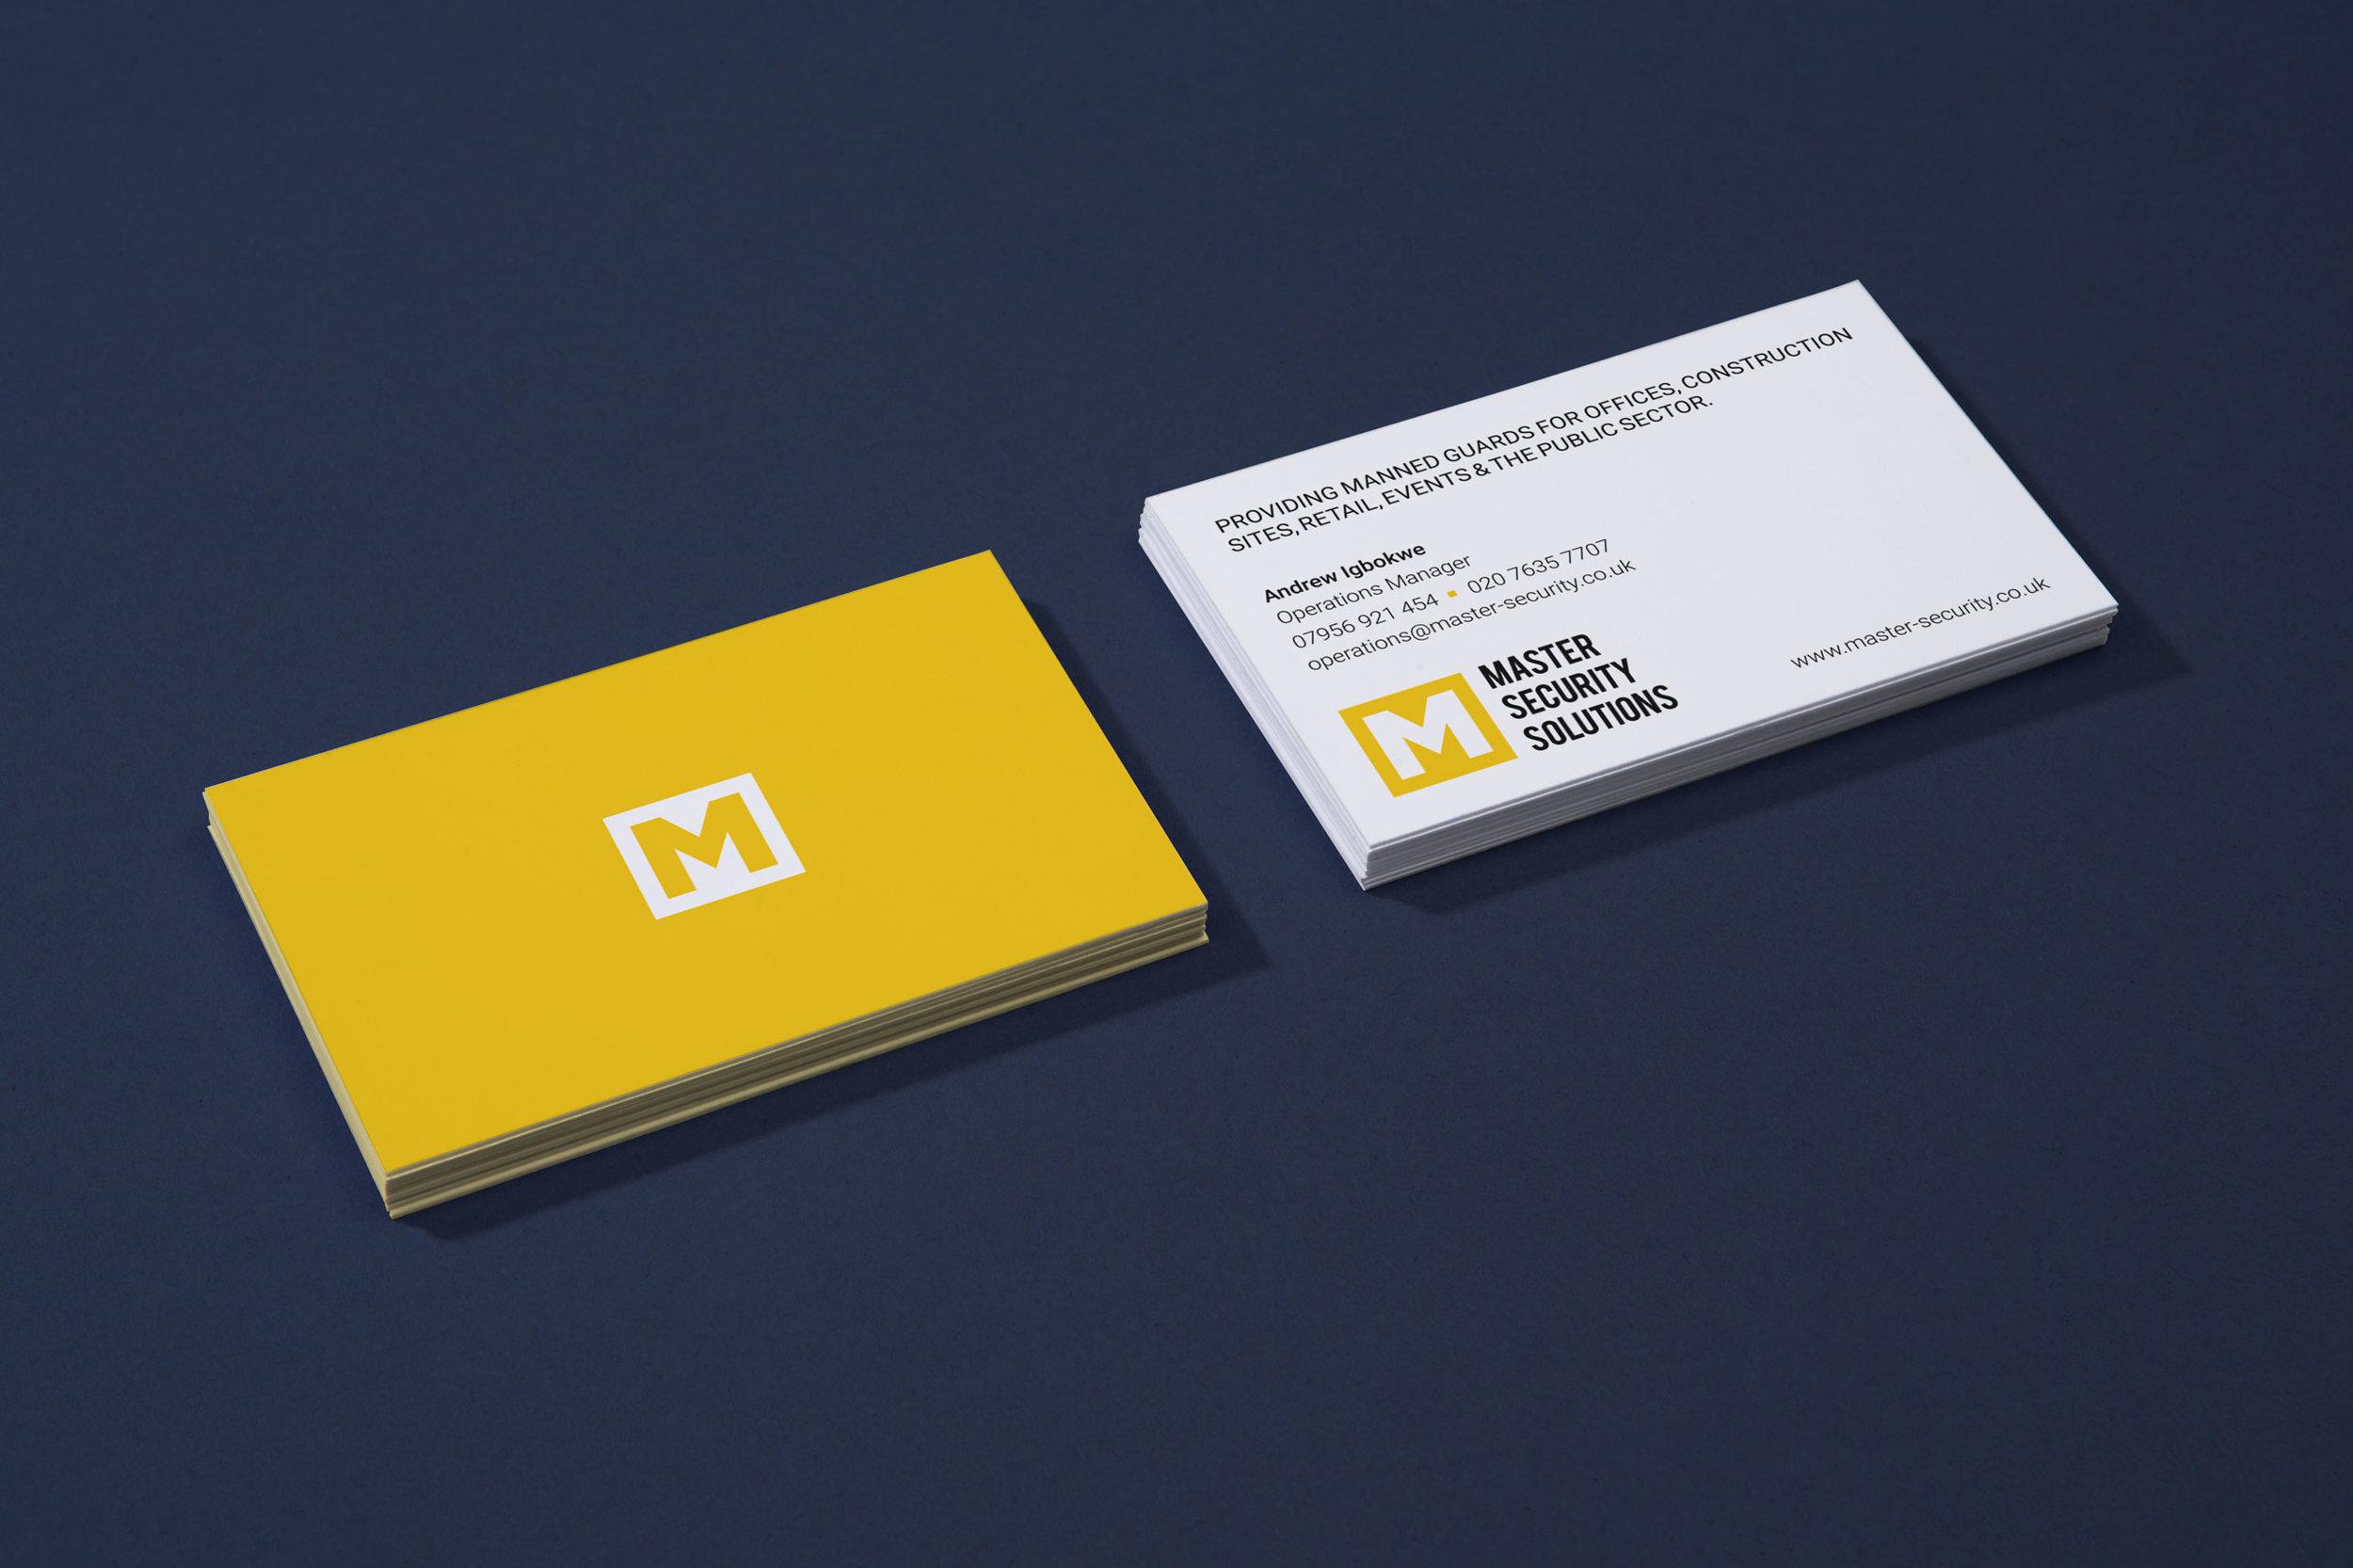 WRB-Design_Blanks_014_cards.jpg